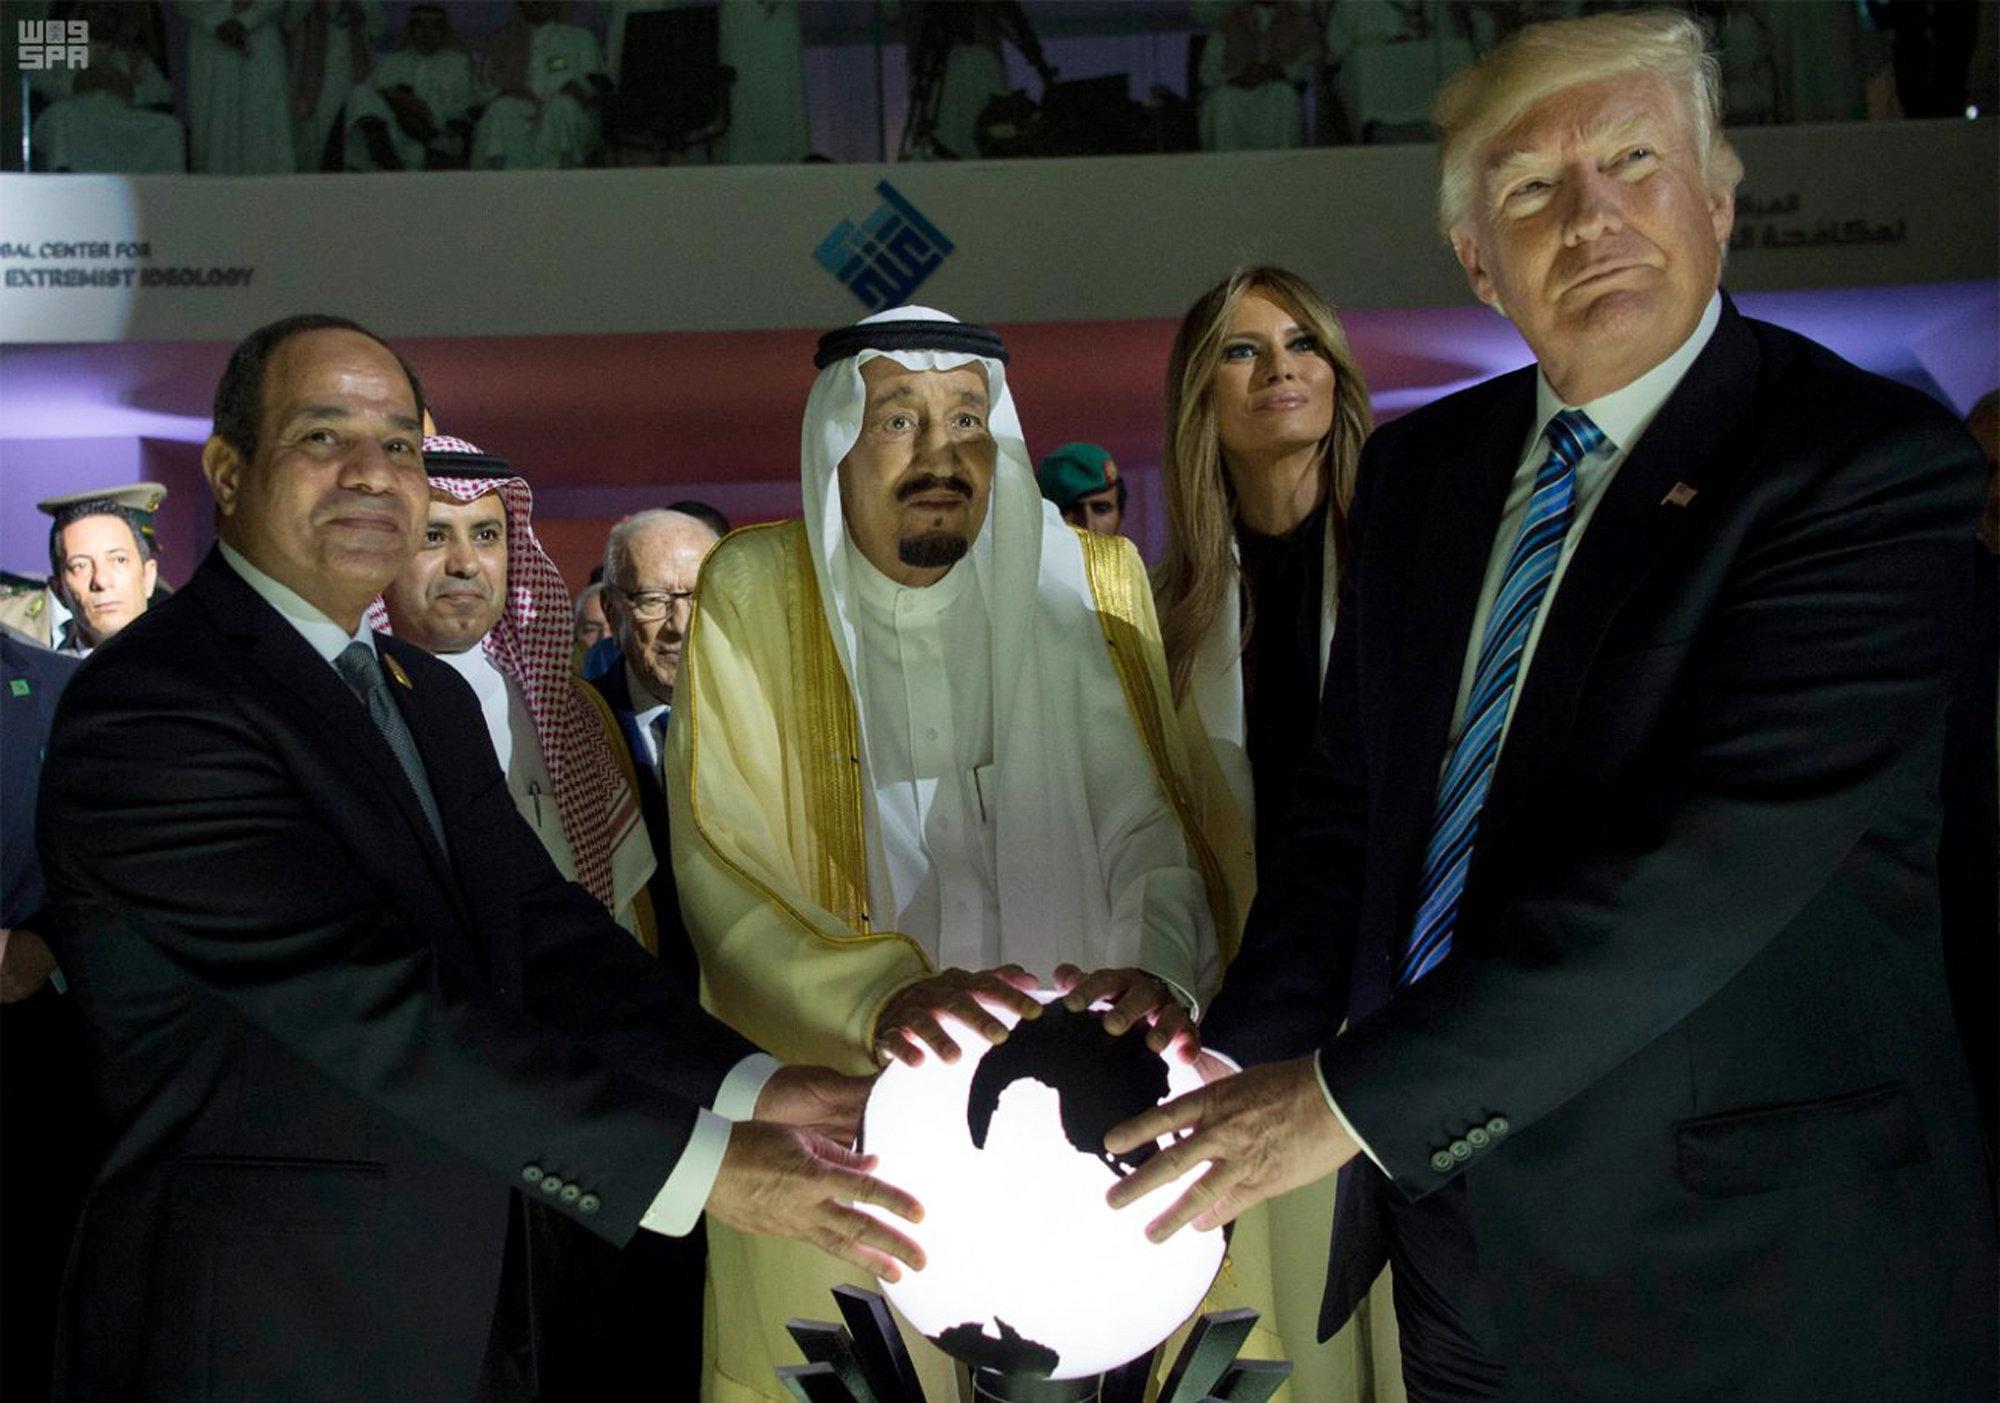 Trump And His Supporters Seem Primed To Accept Saudi Denials Over Jamal Khashoggi